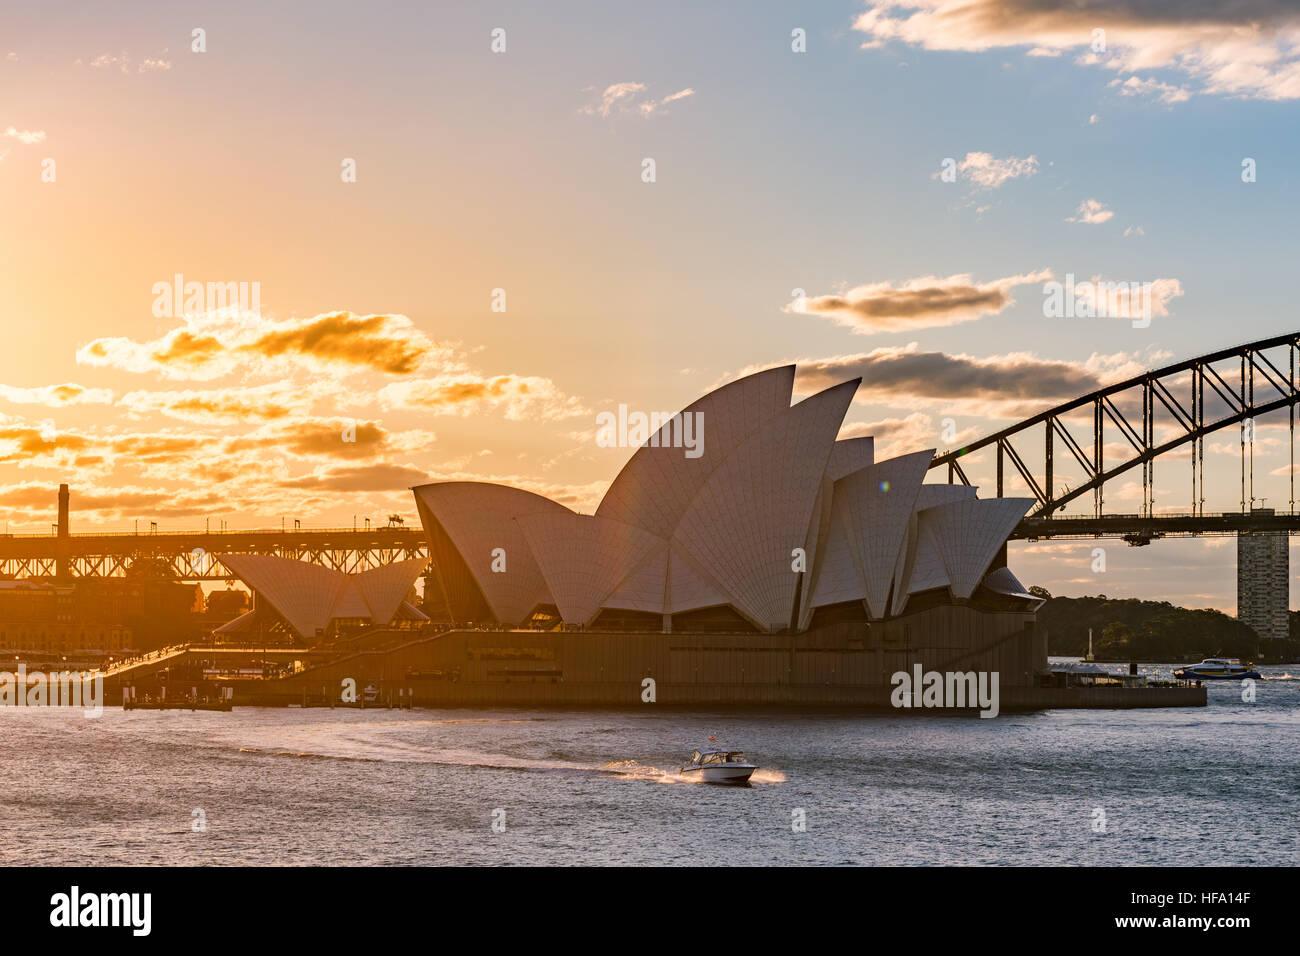 Sydney, city skyline at sunset, Australia - Stock Image